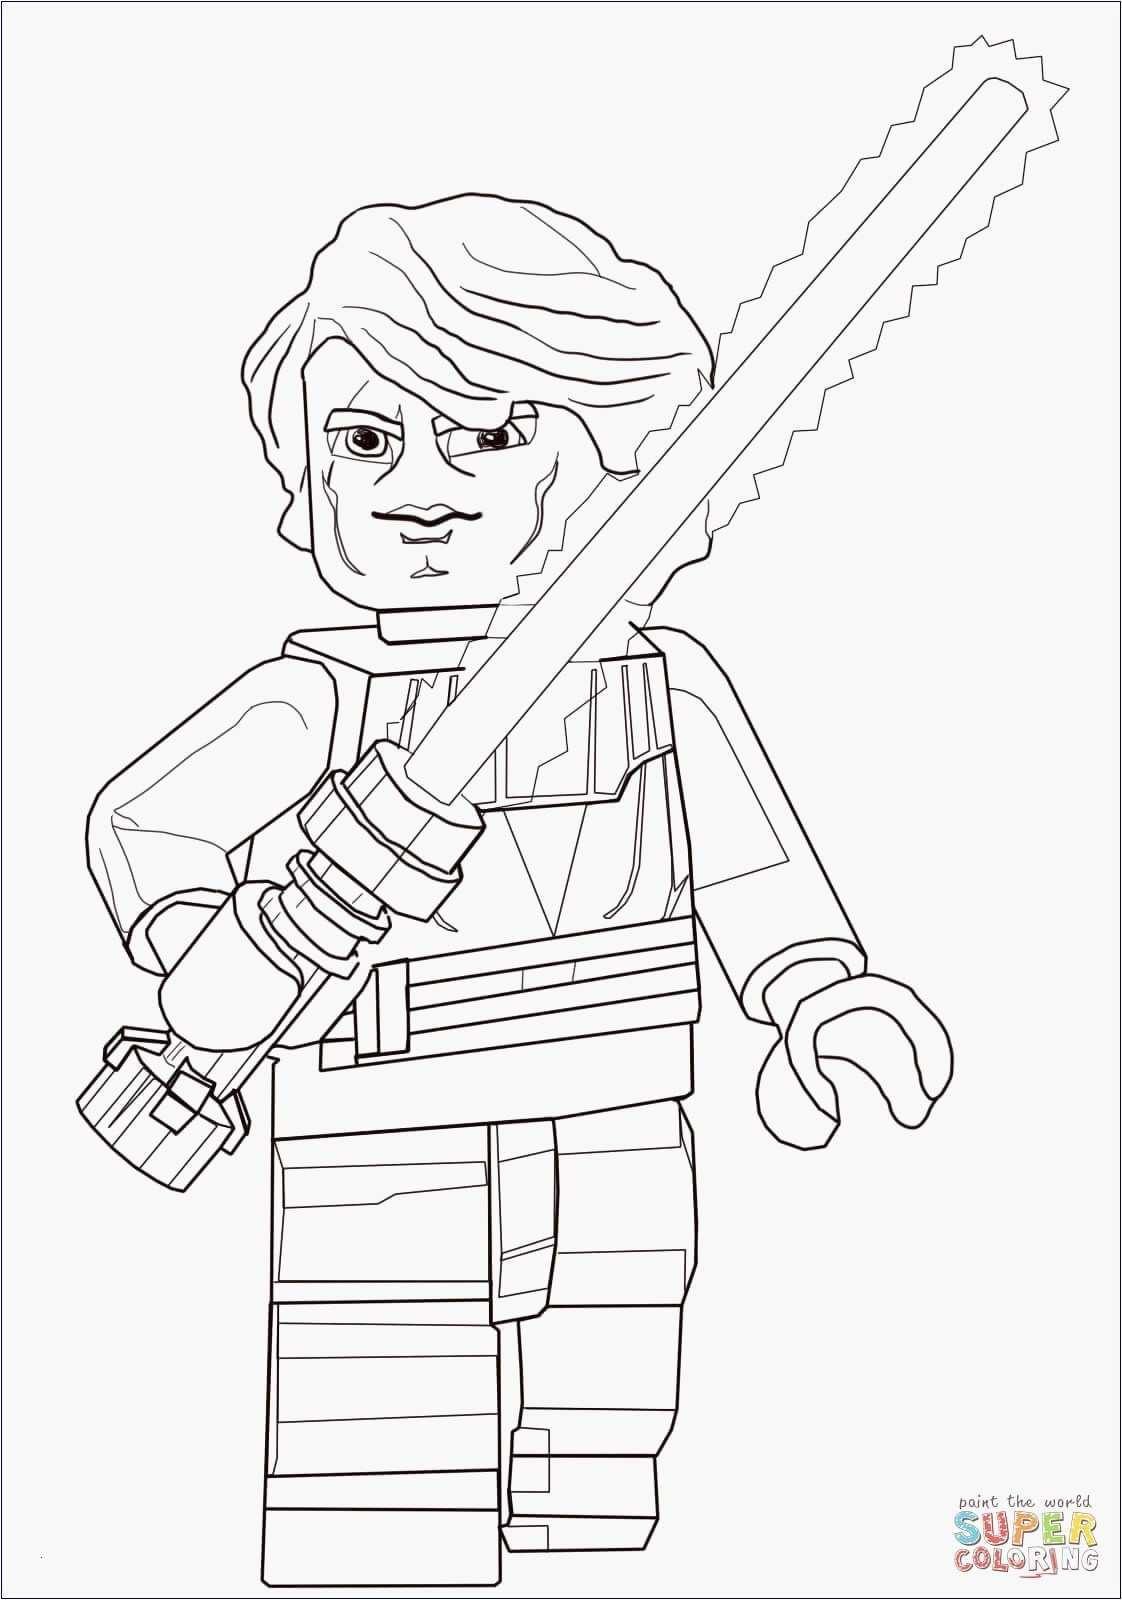 Lego Star Wars Ausmalbilder Genial 47 Meilleur De Coloriage Star Wars Rey Coloriage Kids Bilder